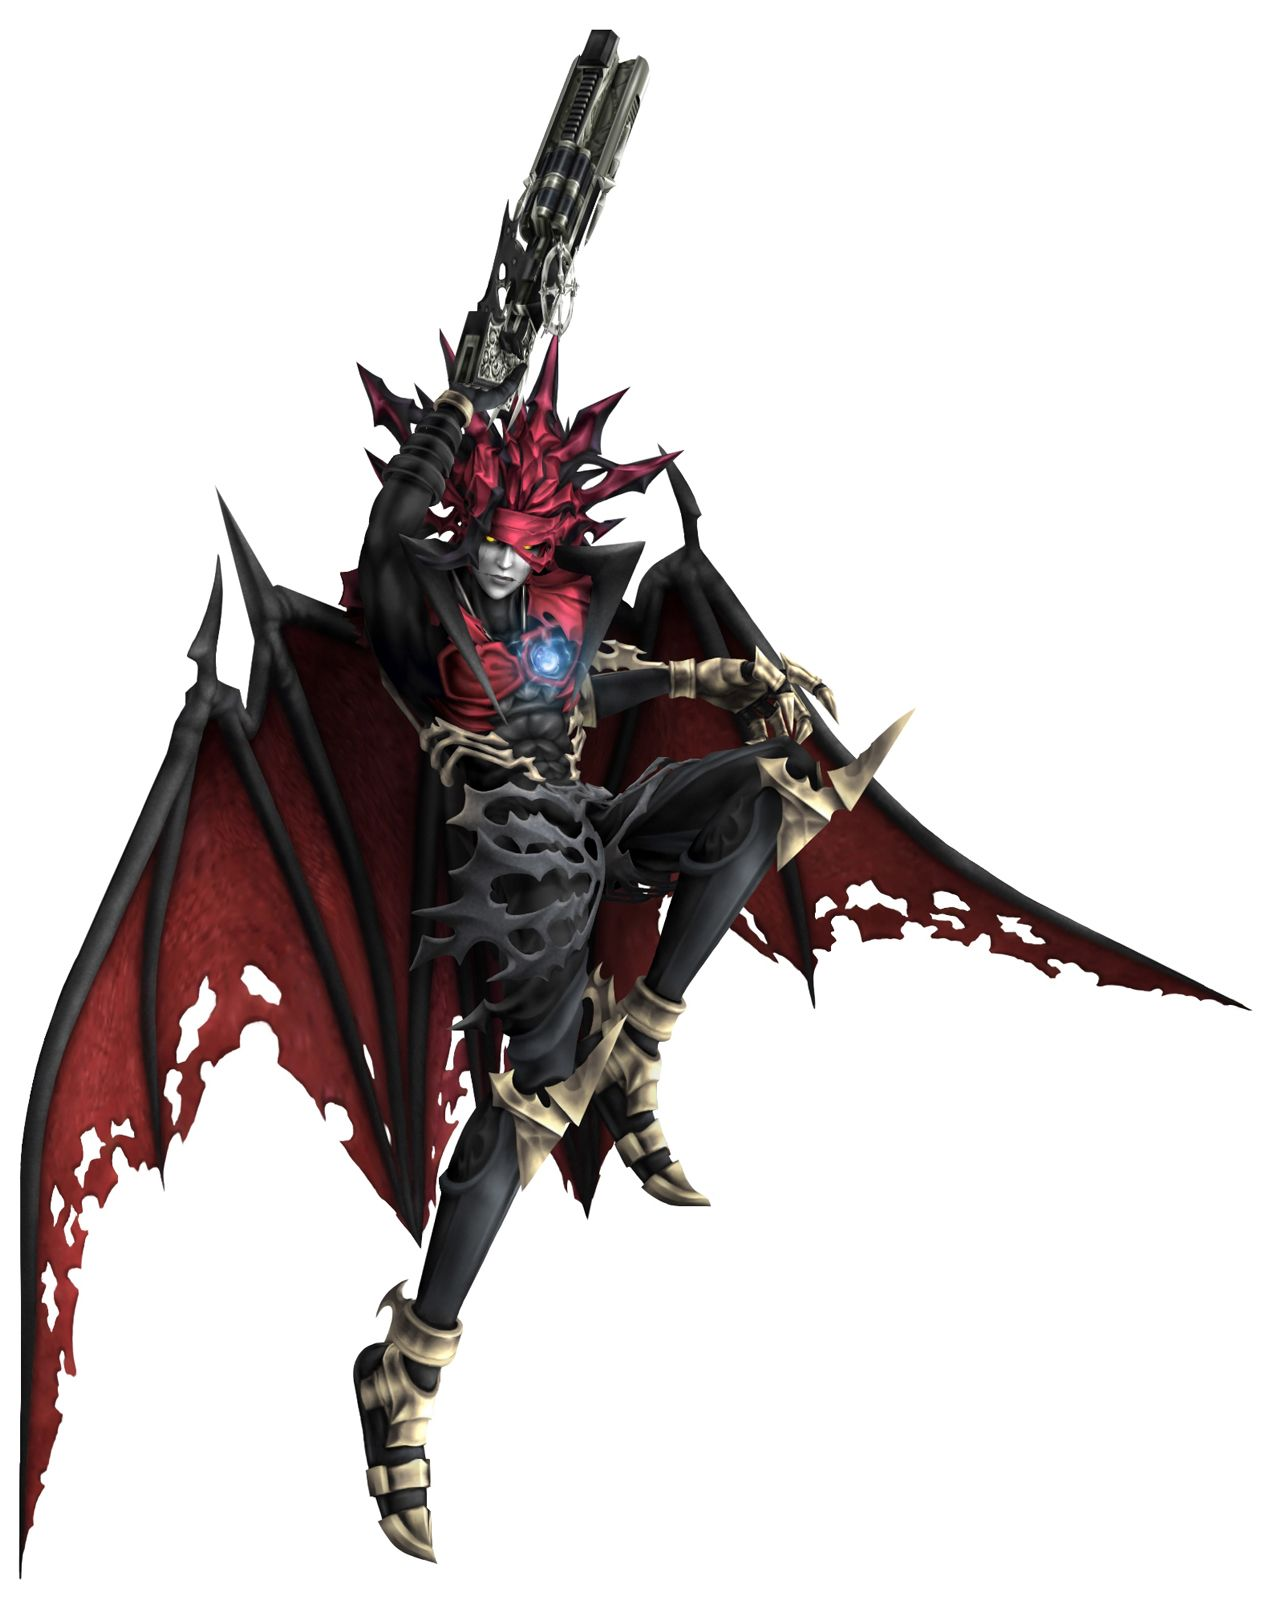 Chaos Final Fantasy VII Final Fantasy VII Final